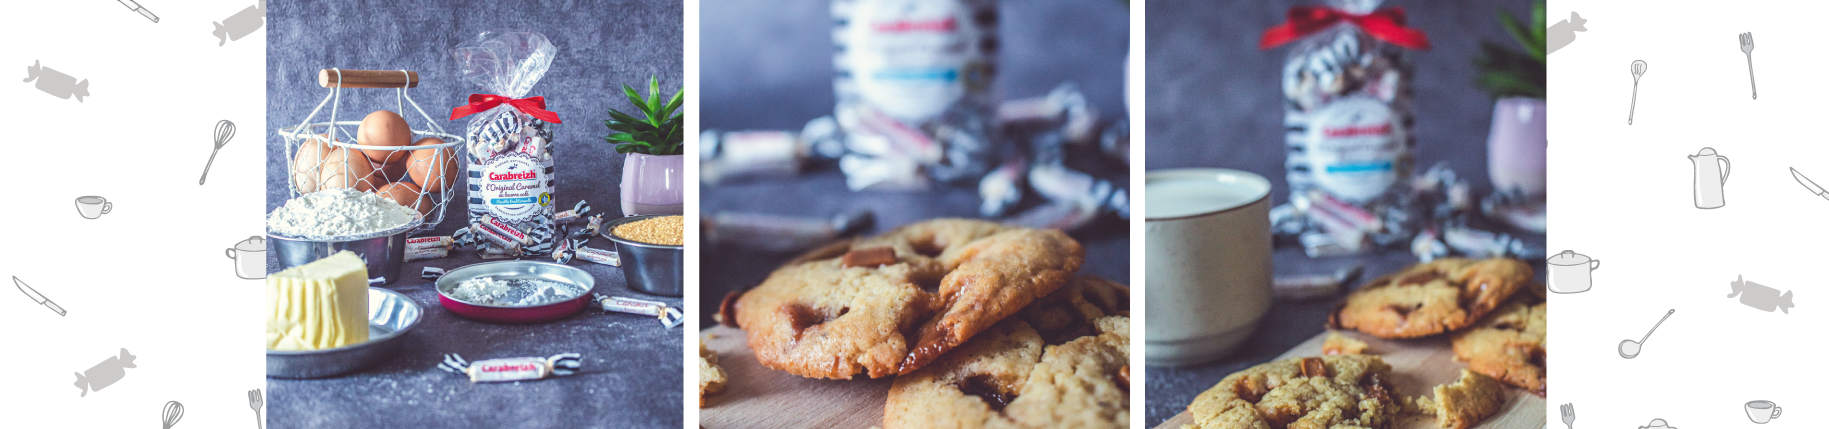 Cookies au caramel en barre Carabreizh méga chunky